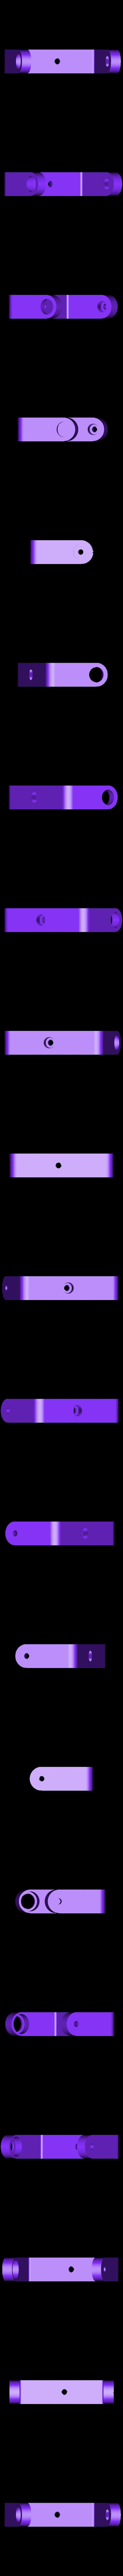 pan02.STL Download free STL file Pan, tilt and roll camera pod for FPV. • 3D printing object, tahustvedt